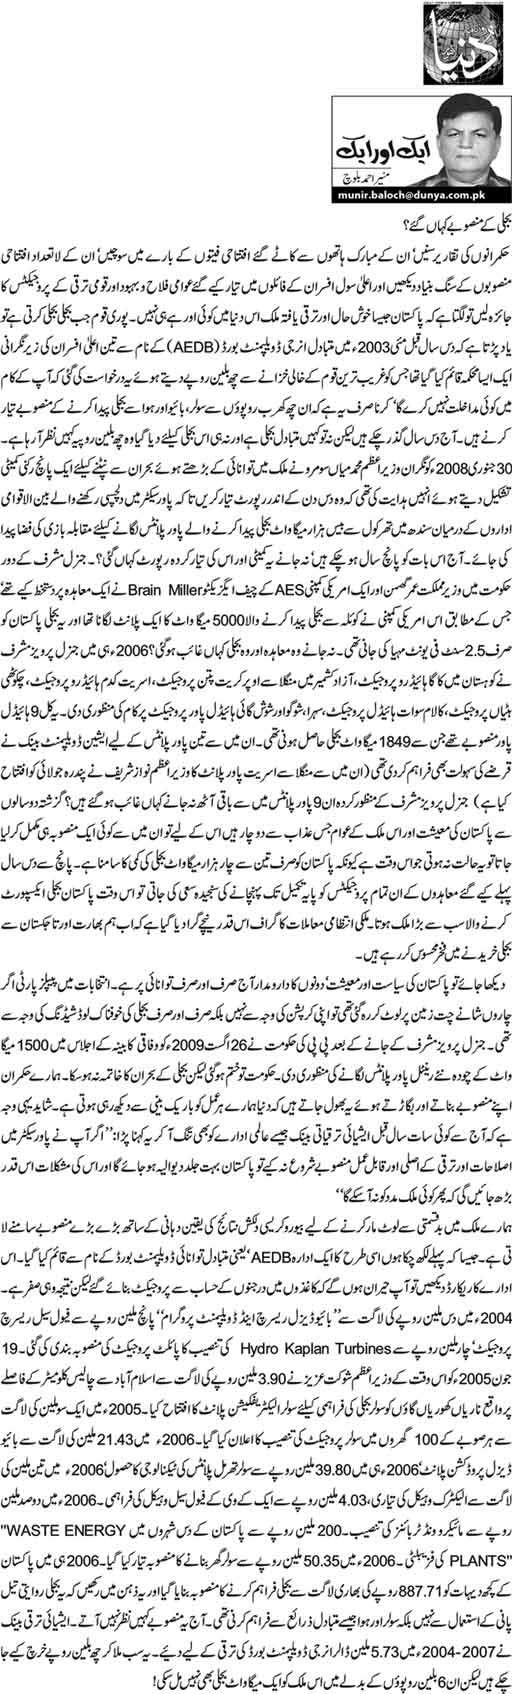 Bijli K Mansoobay Kahan Gay? - Munir Ahmed Baloch